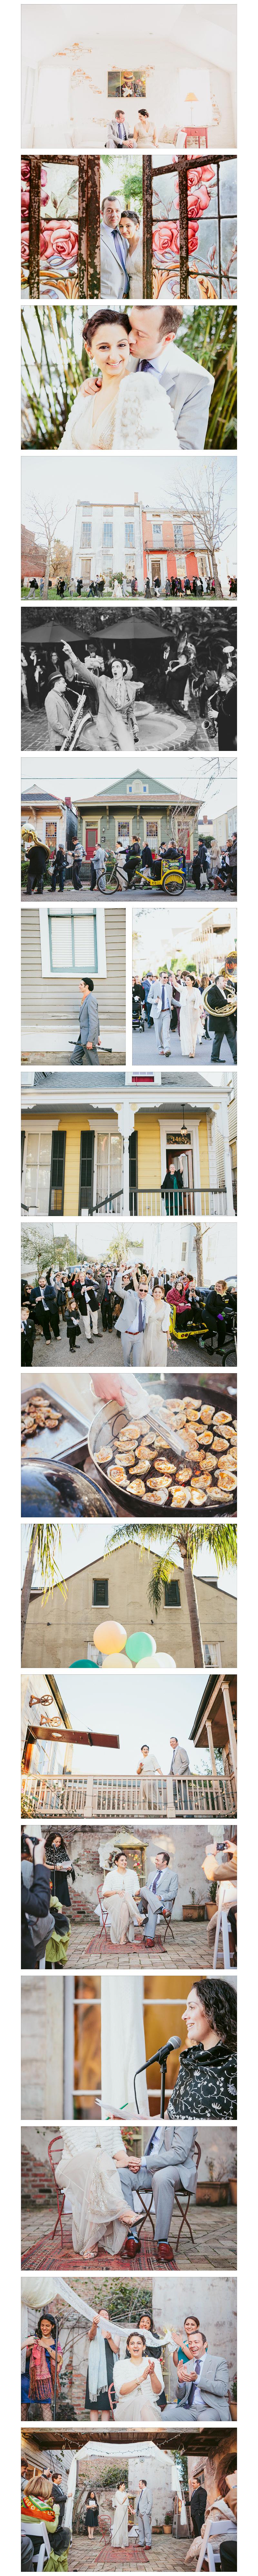 race-and-religious-wedding-in-NOLA-2.jpg